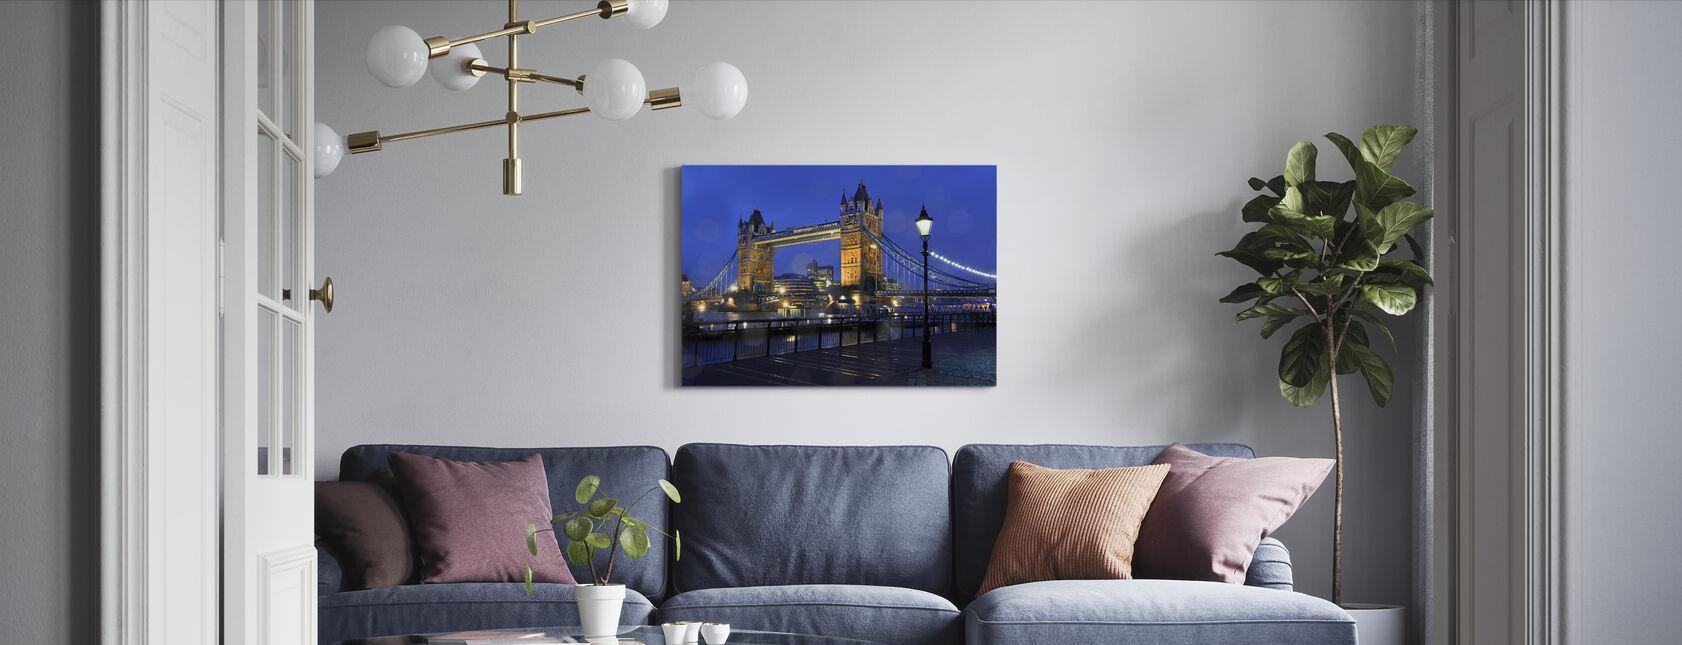 Tower Bridge London - Canvas print - Living Room